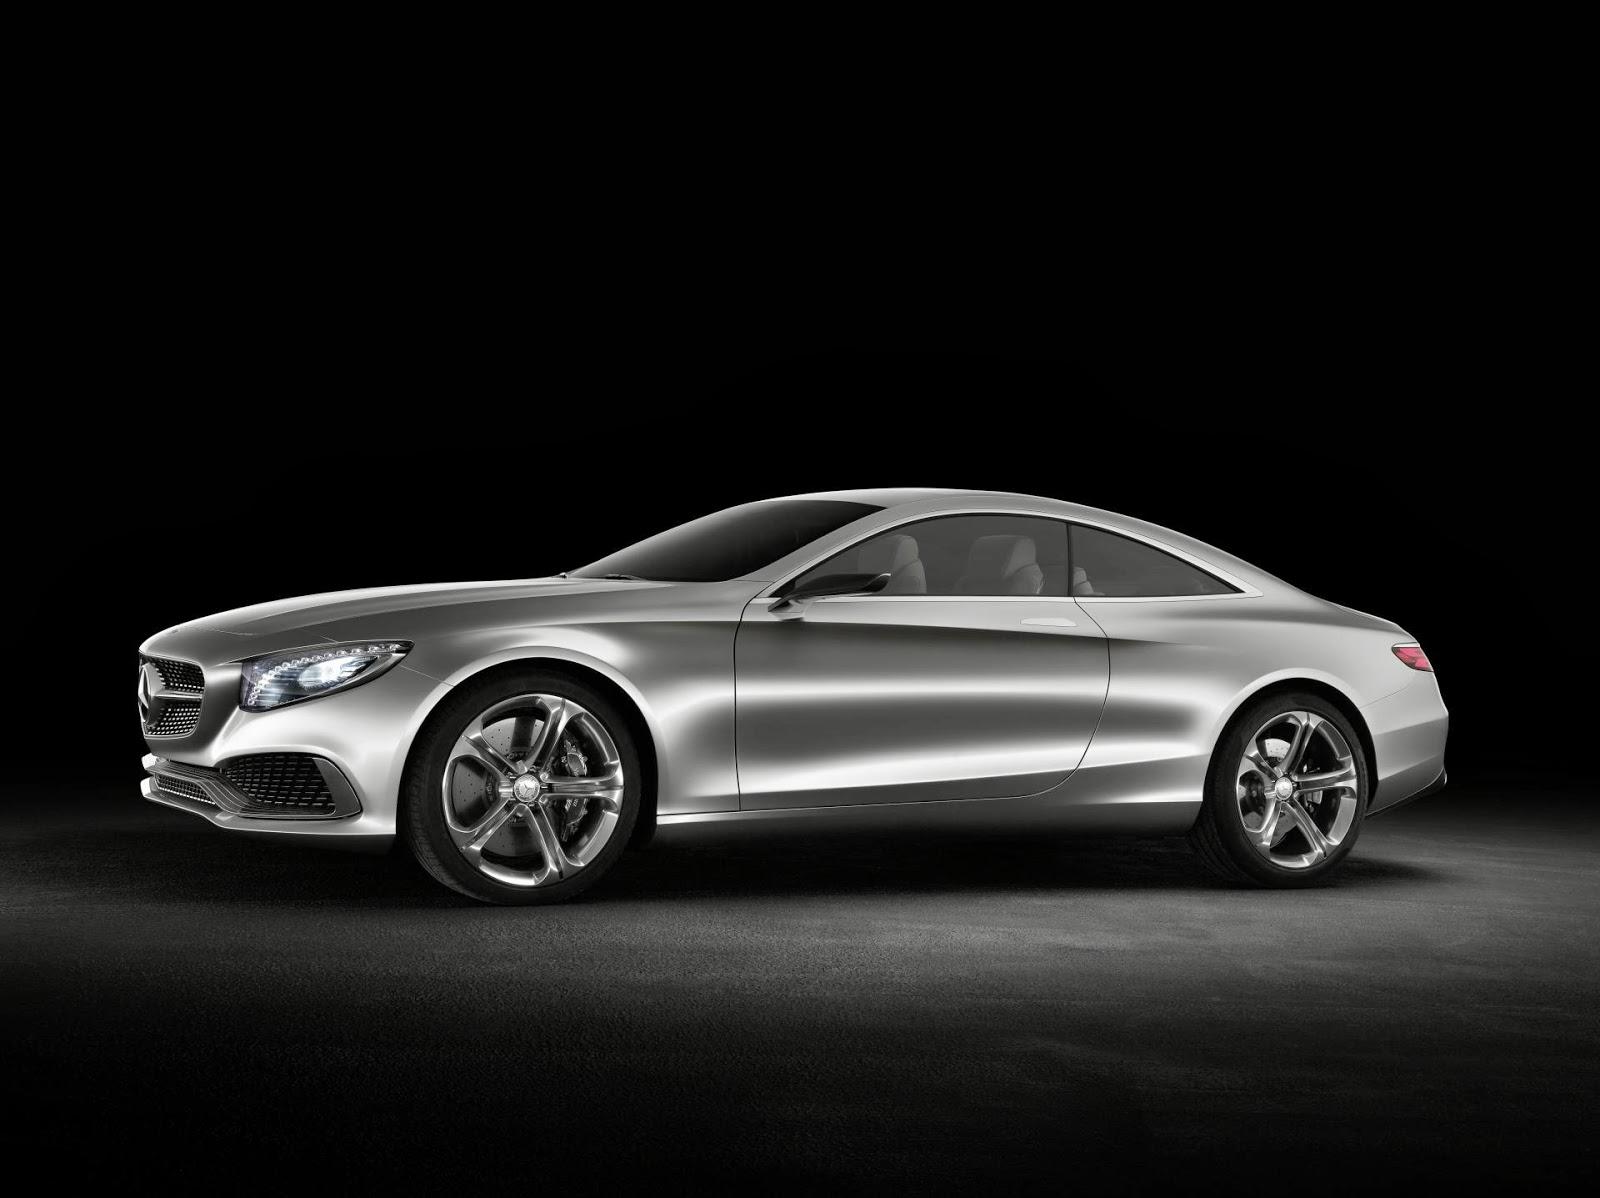 mercedes benz s class coupe concept 2013 hottest car wallpapers bestgarage. Black Bedroom Furniture Sets. Home Design Ideas